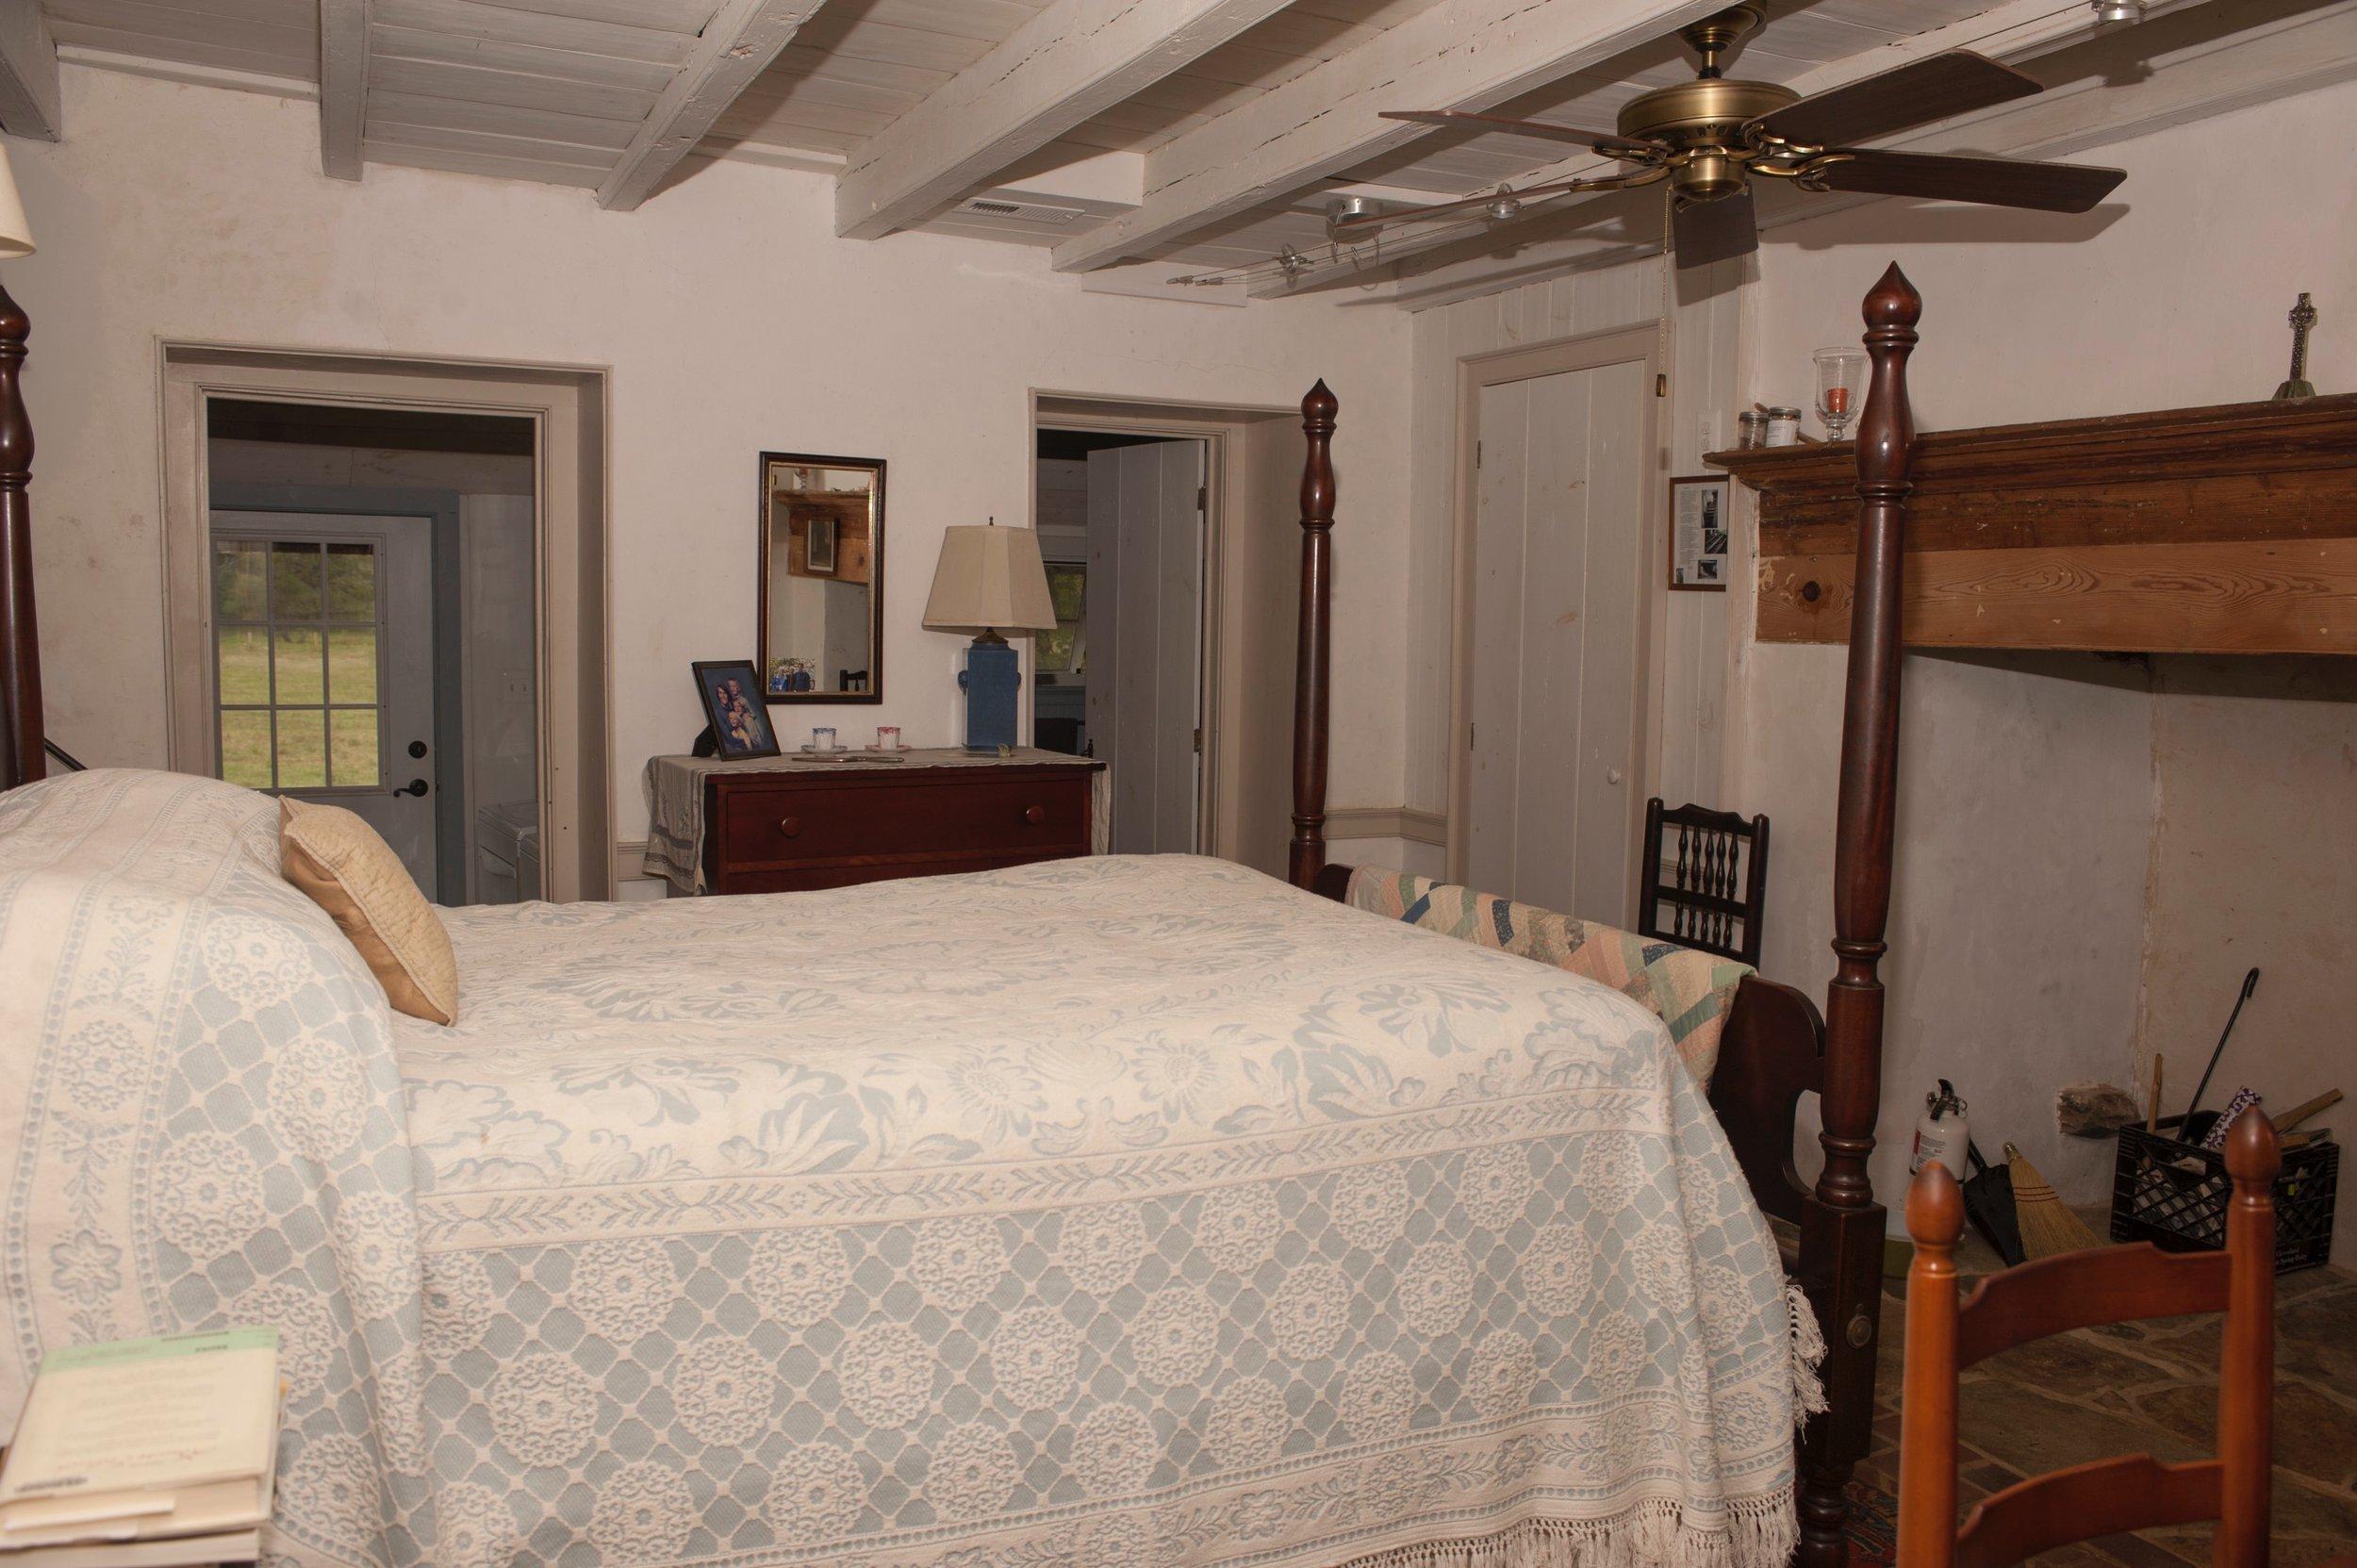 Master bedroom features restored beams and radiant-heat brick floor.